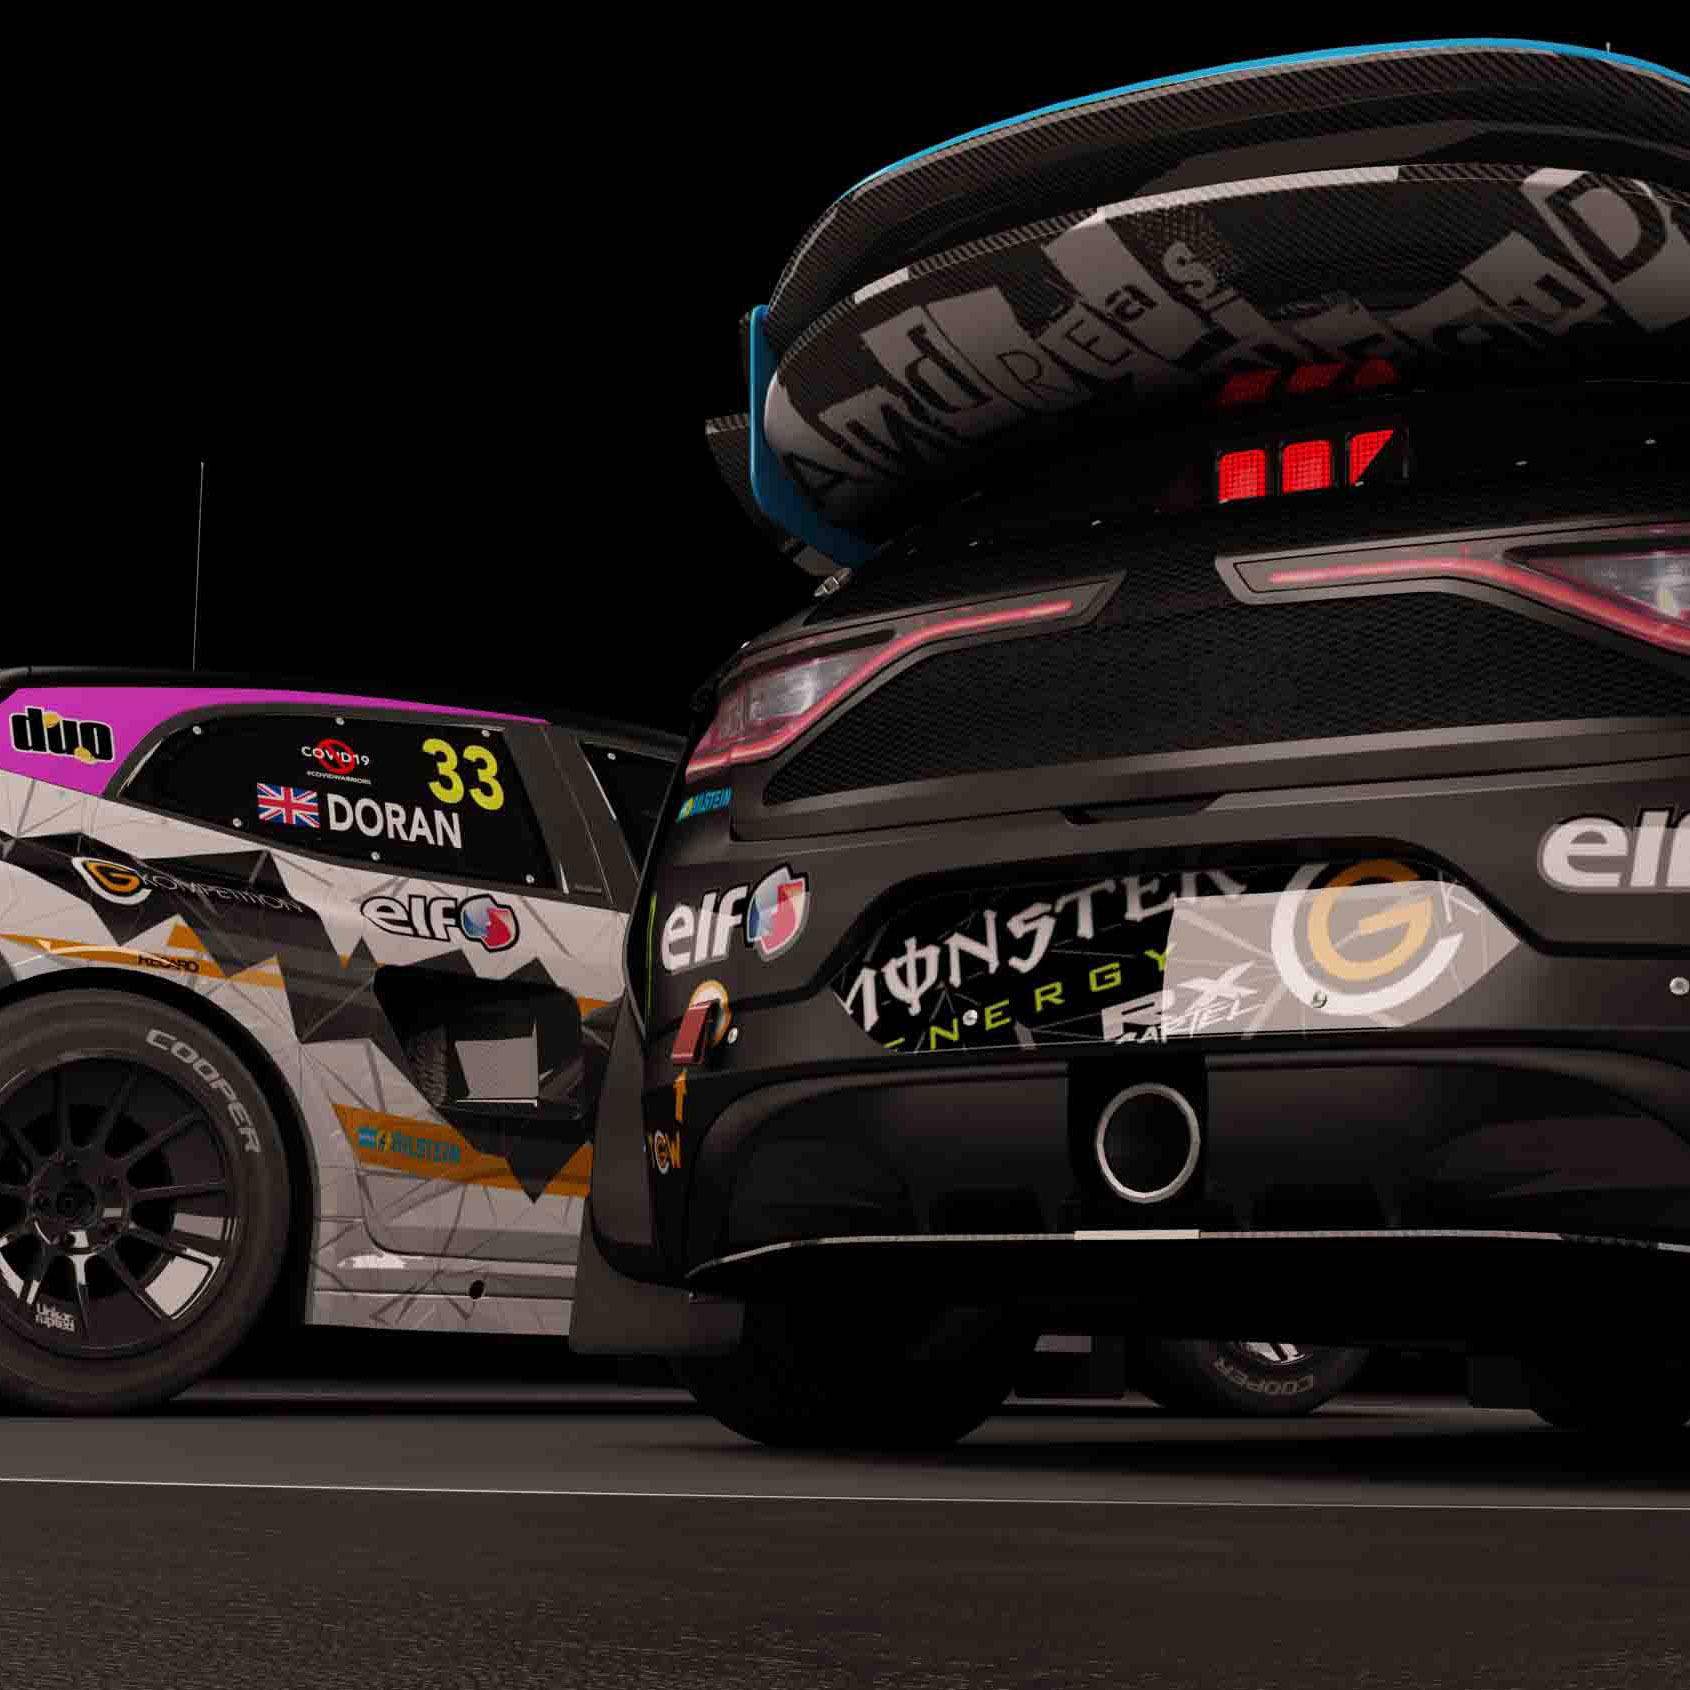 Renault Megane FIA World Rallycross AMD 02 a